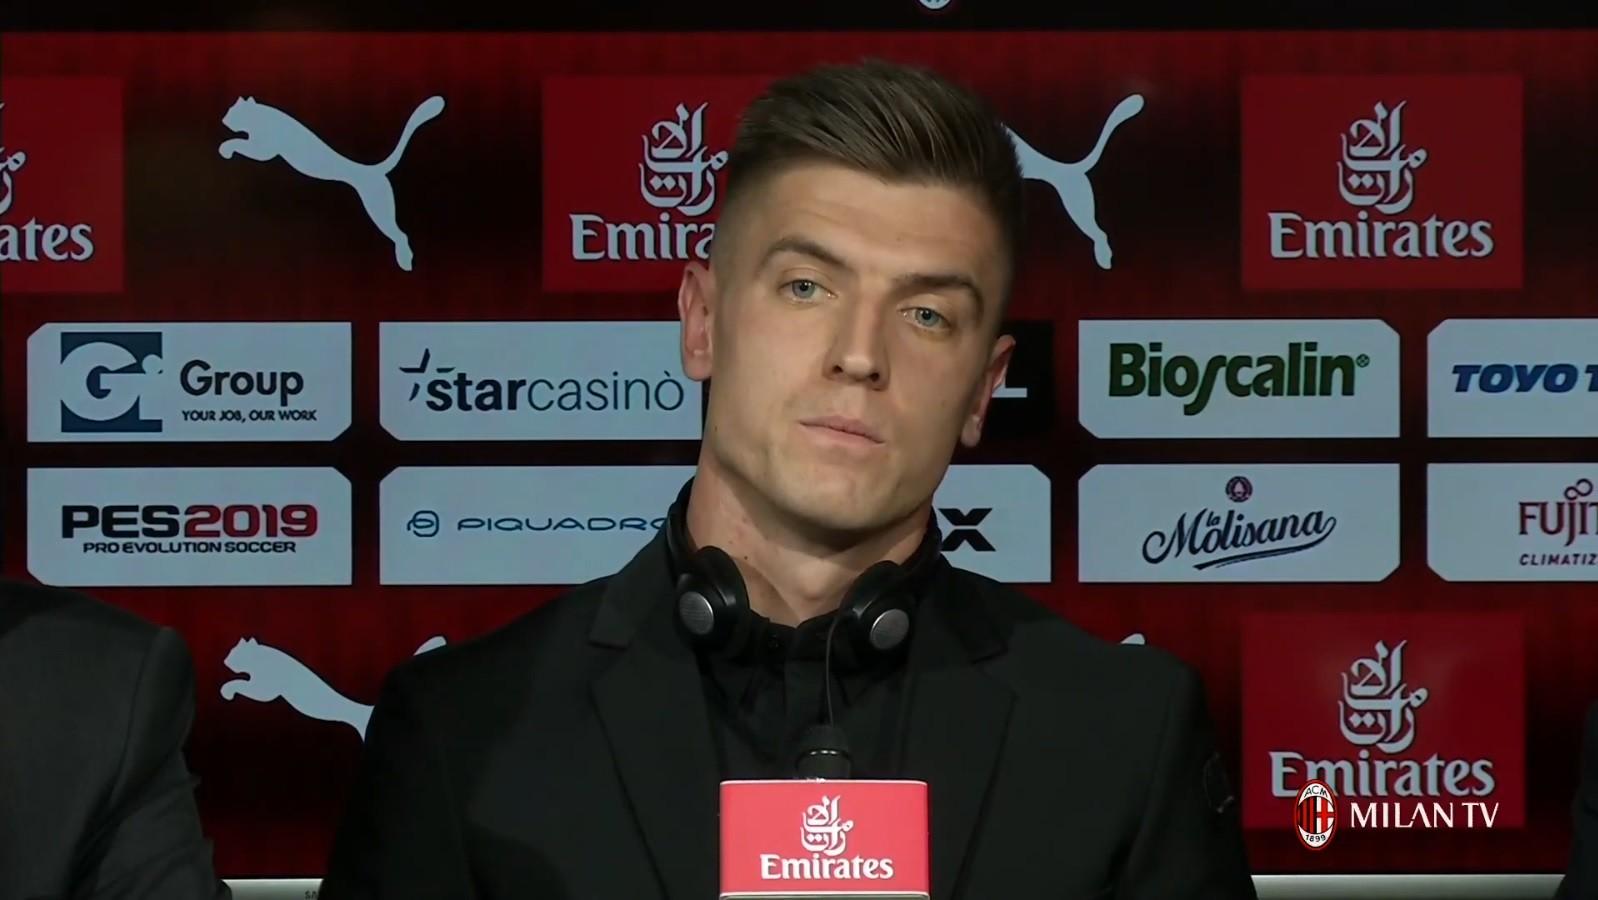 Bayern Munich : Krzysztof Piątek (AC Milan) successeur de Lewandowski ?